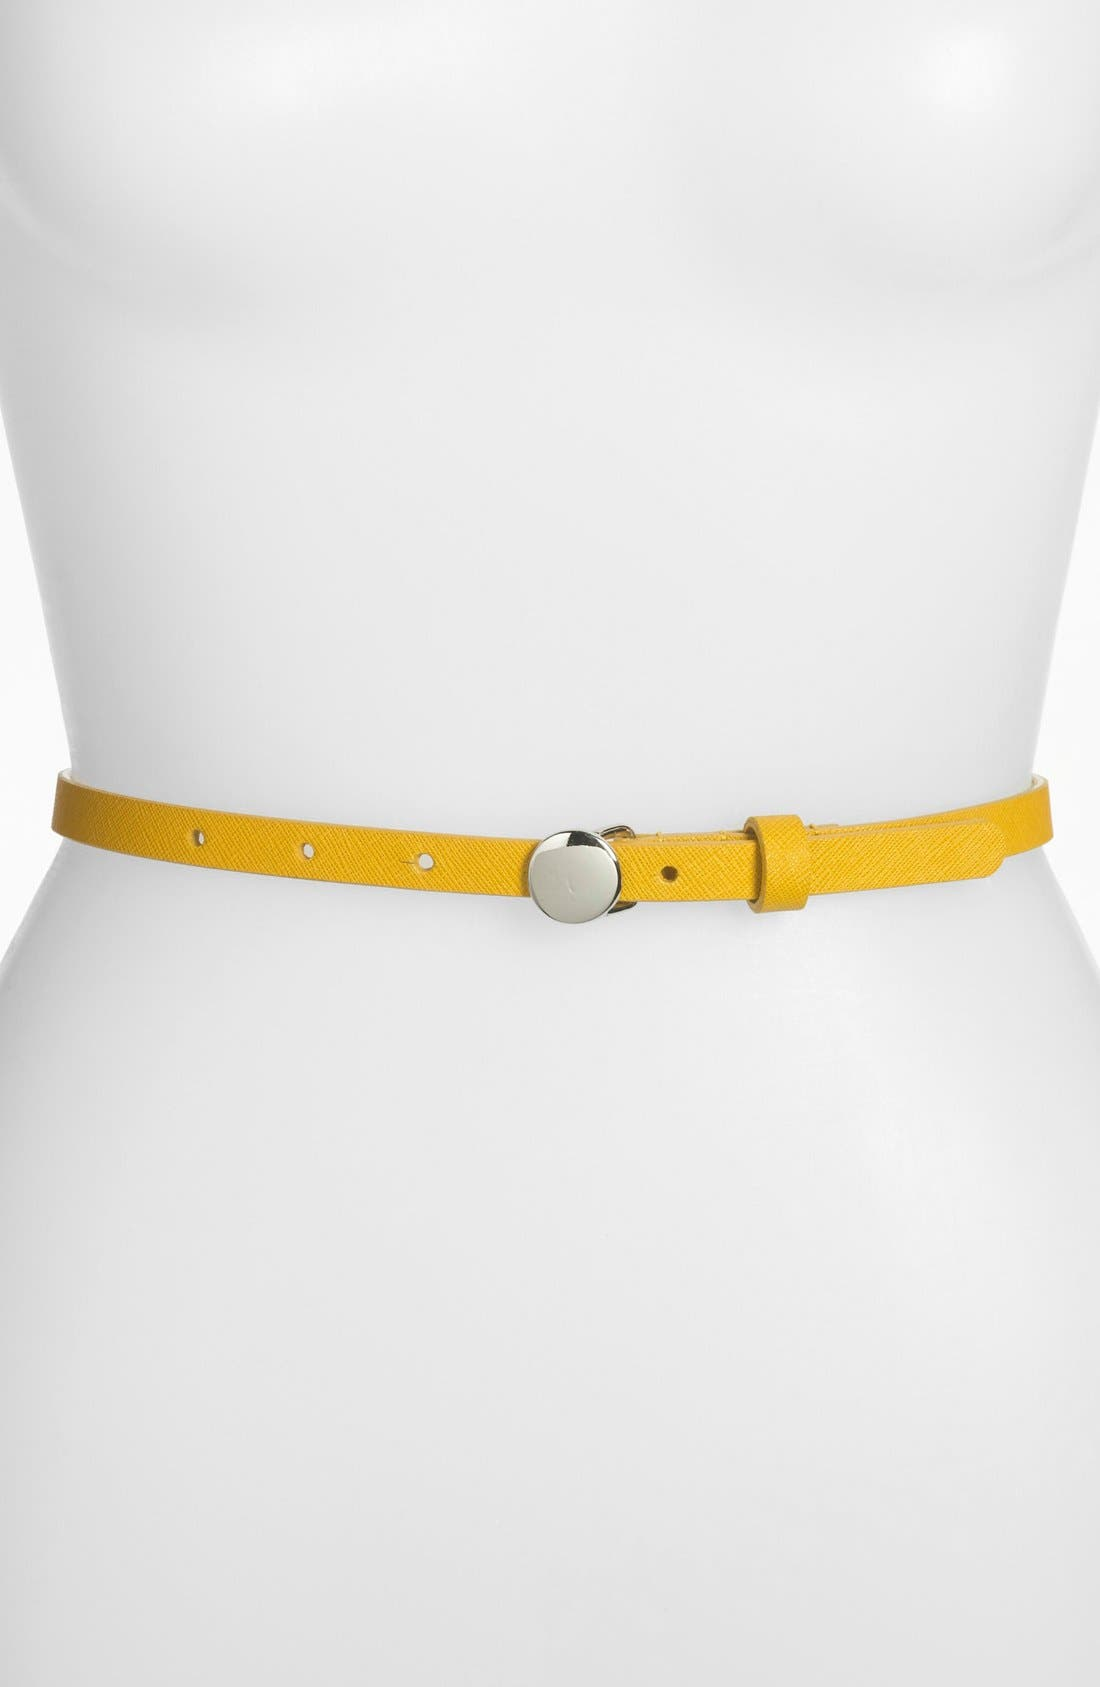 Main Image - Lodis Saffiano Leather Belt